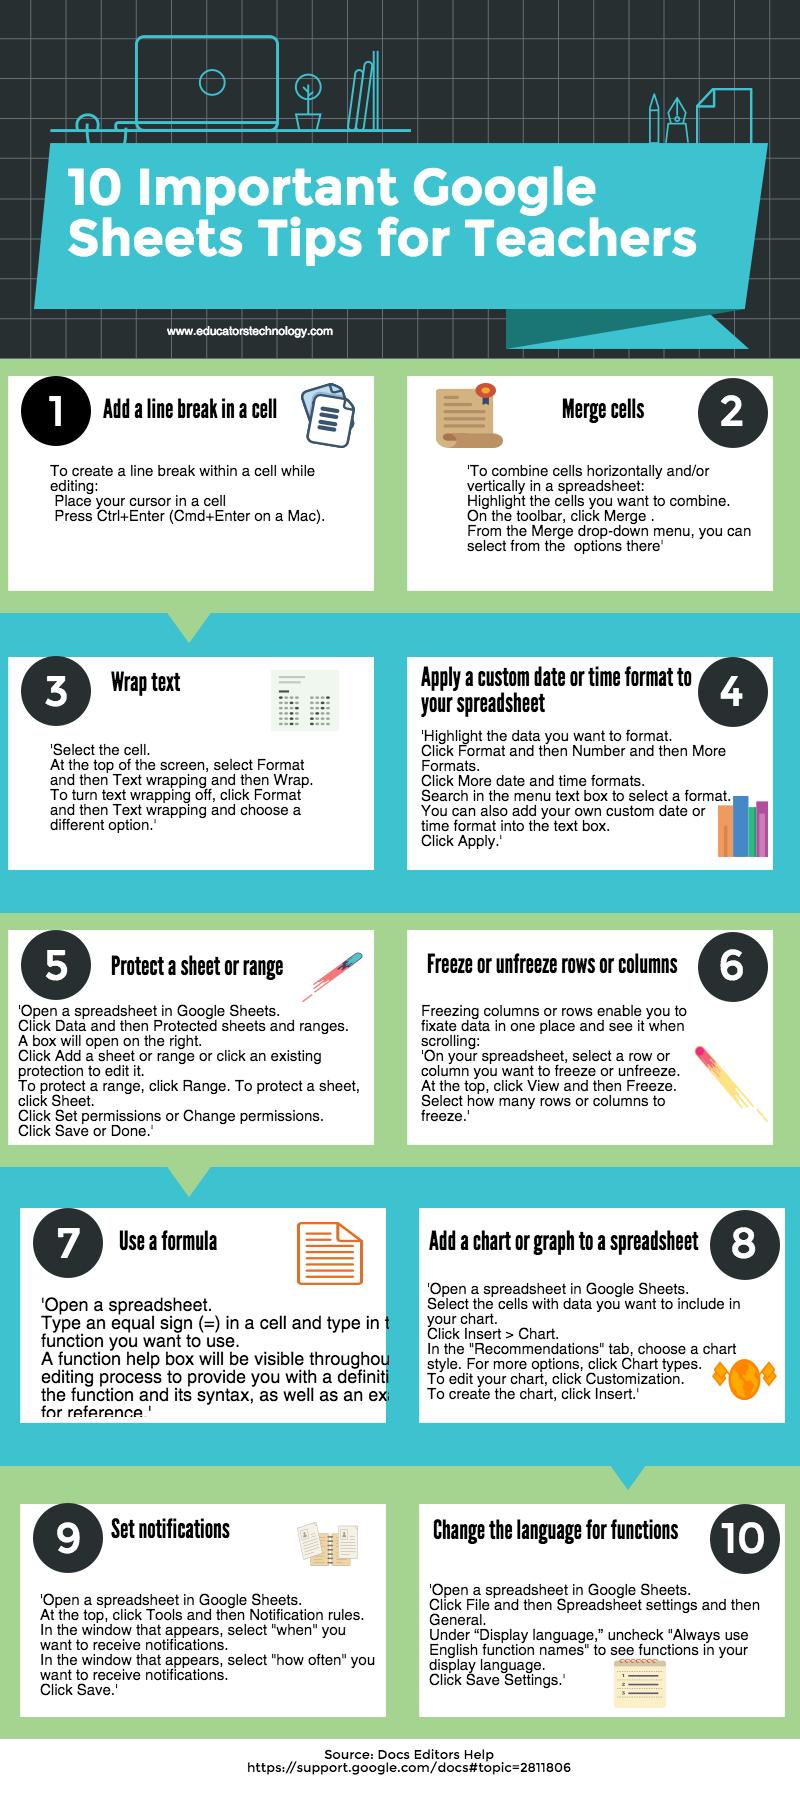 10 Important Google Sheets Tips For Teachers Google Education Educational Technology Teaching Technology